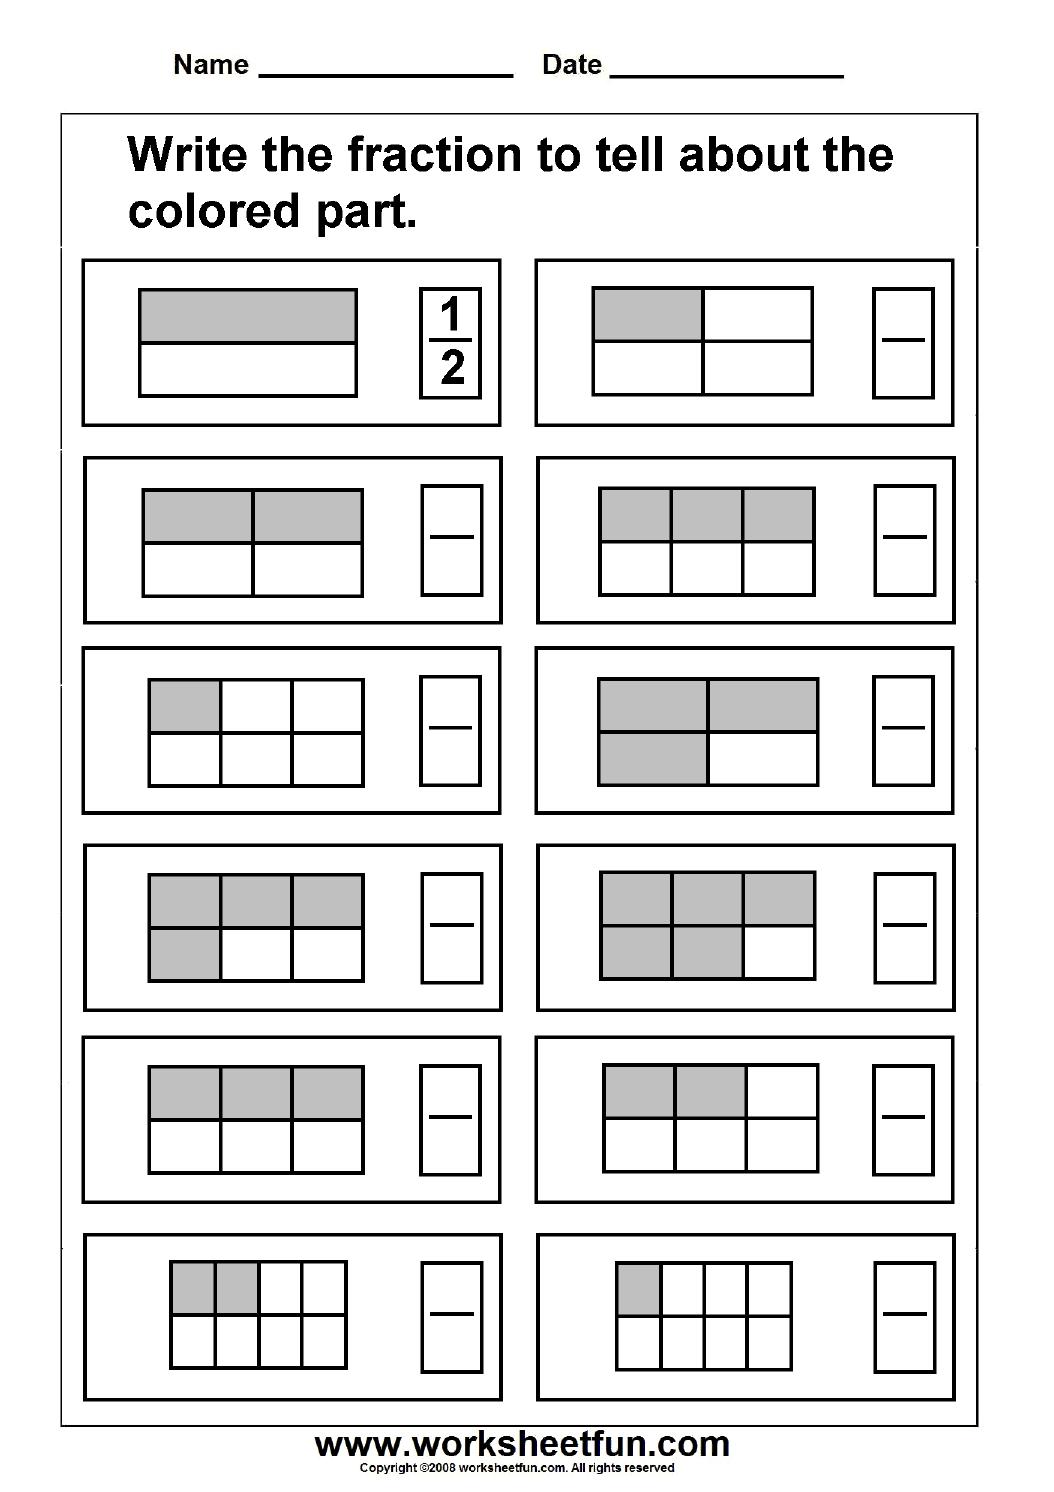 Fraction / Free Printable Worksheets – Worksheetfun   Free Printable Fraction Worksheets